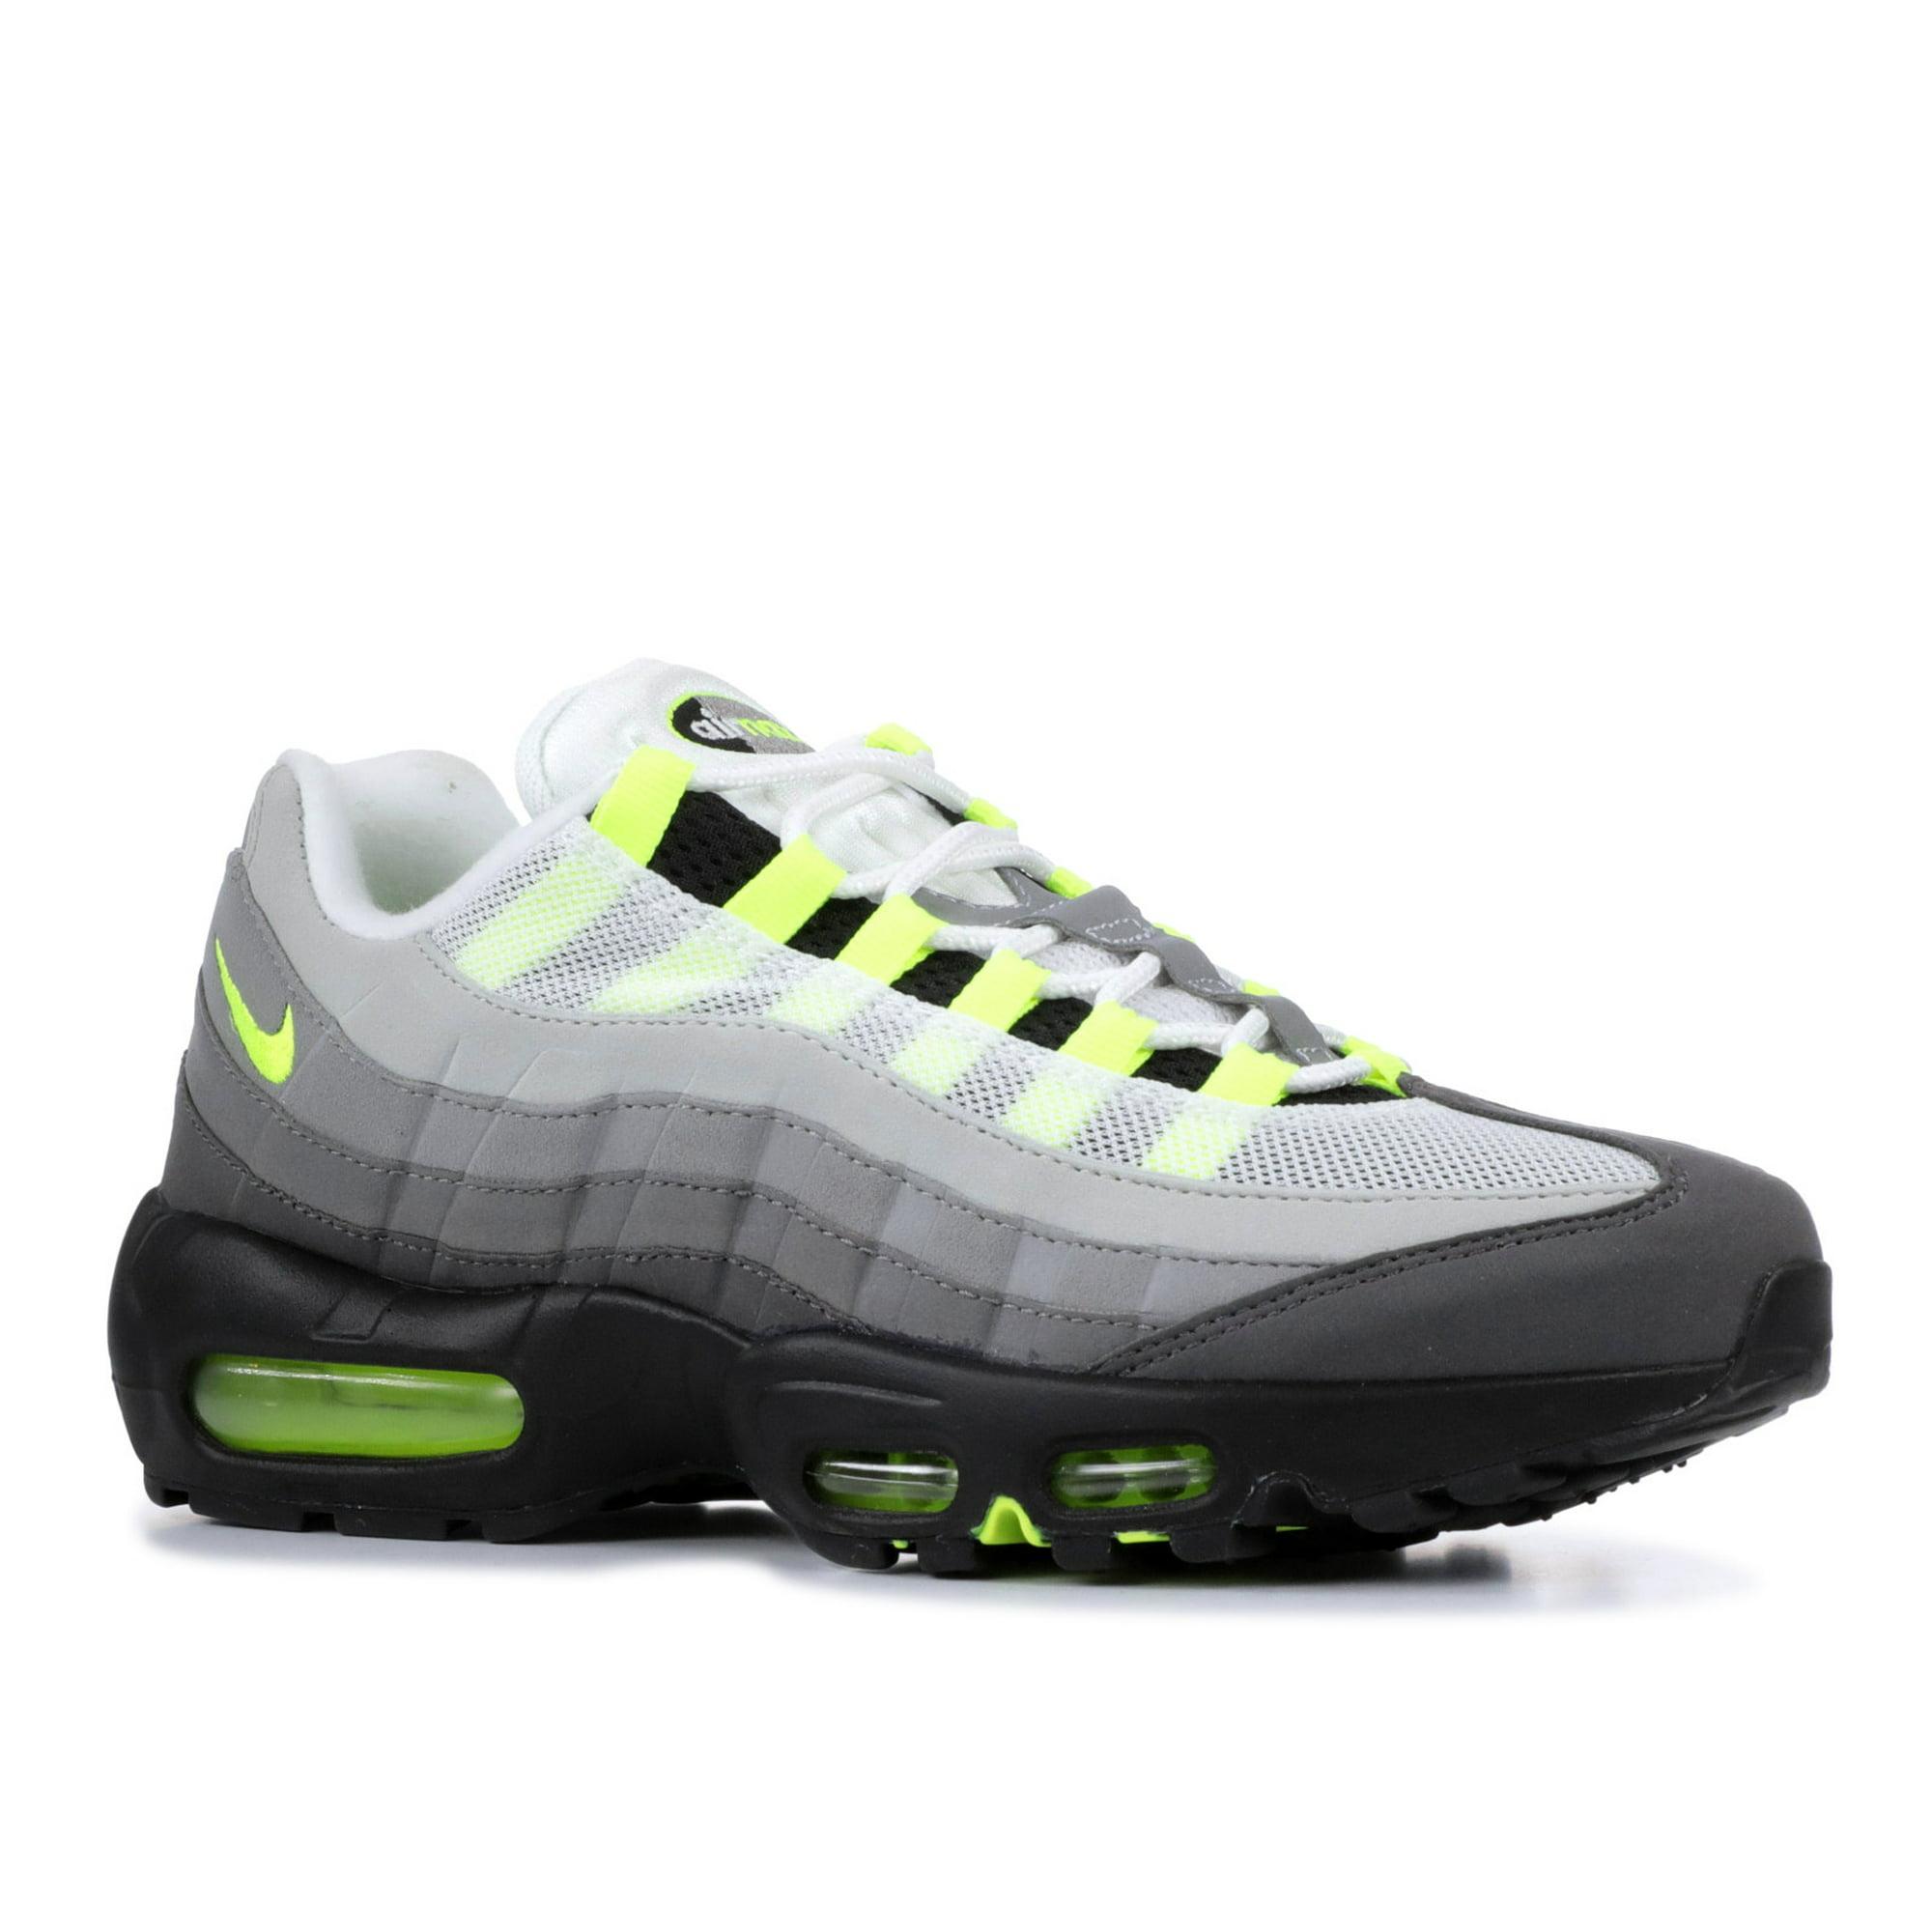 detailed look d6acb e17f6 Nike - Men - Air Max 95 Og  Neon  - 554970-071 - Size 11   Walmart Canada